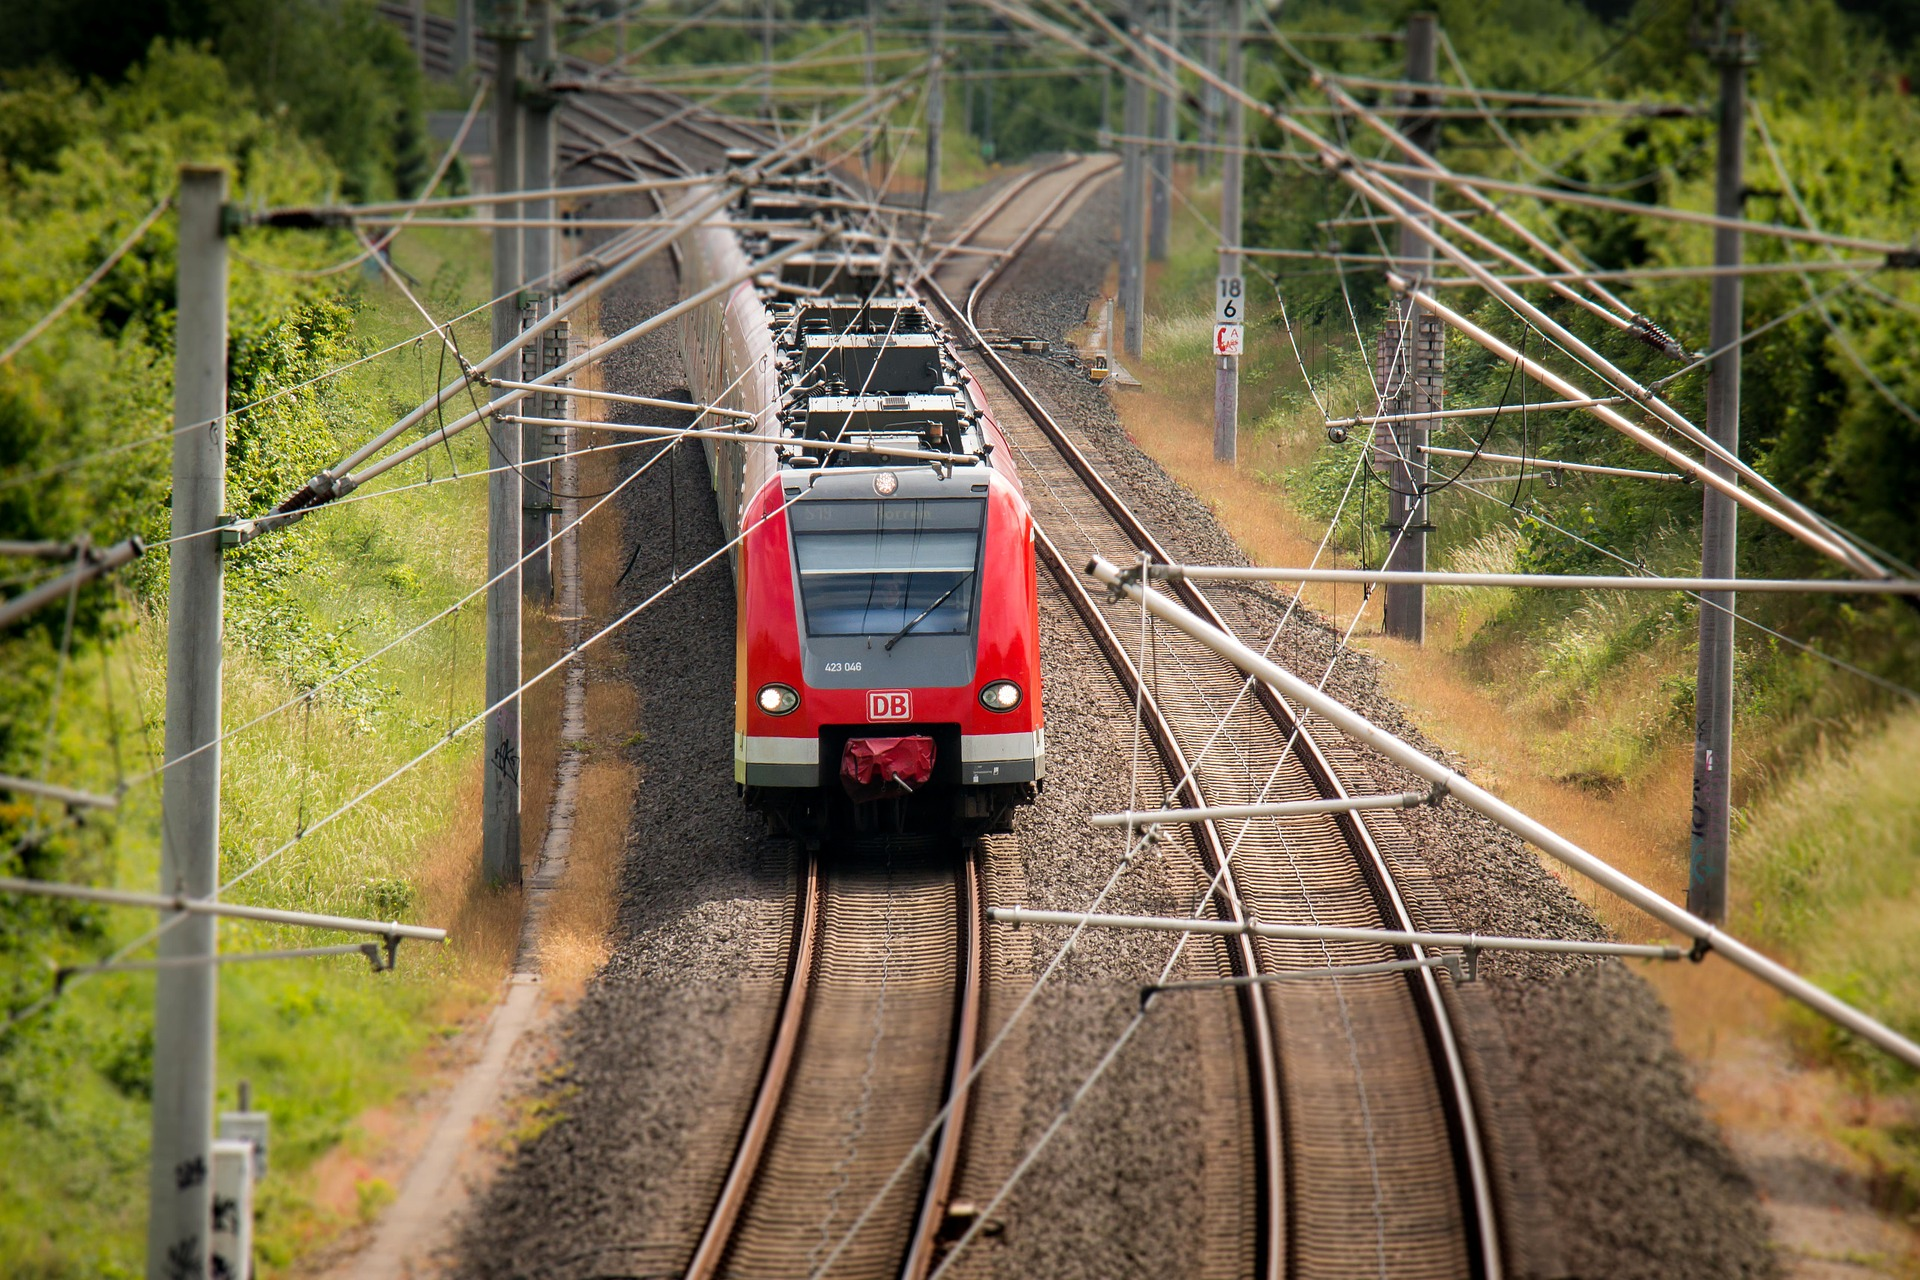 train-797072_1920